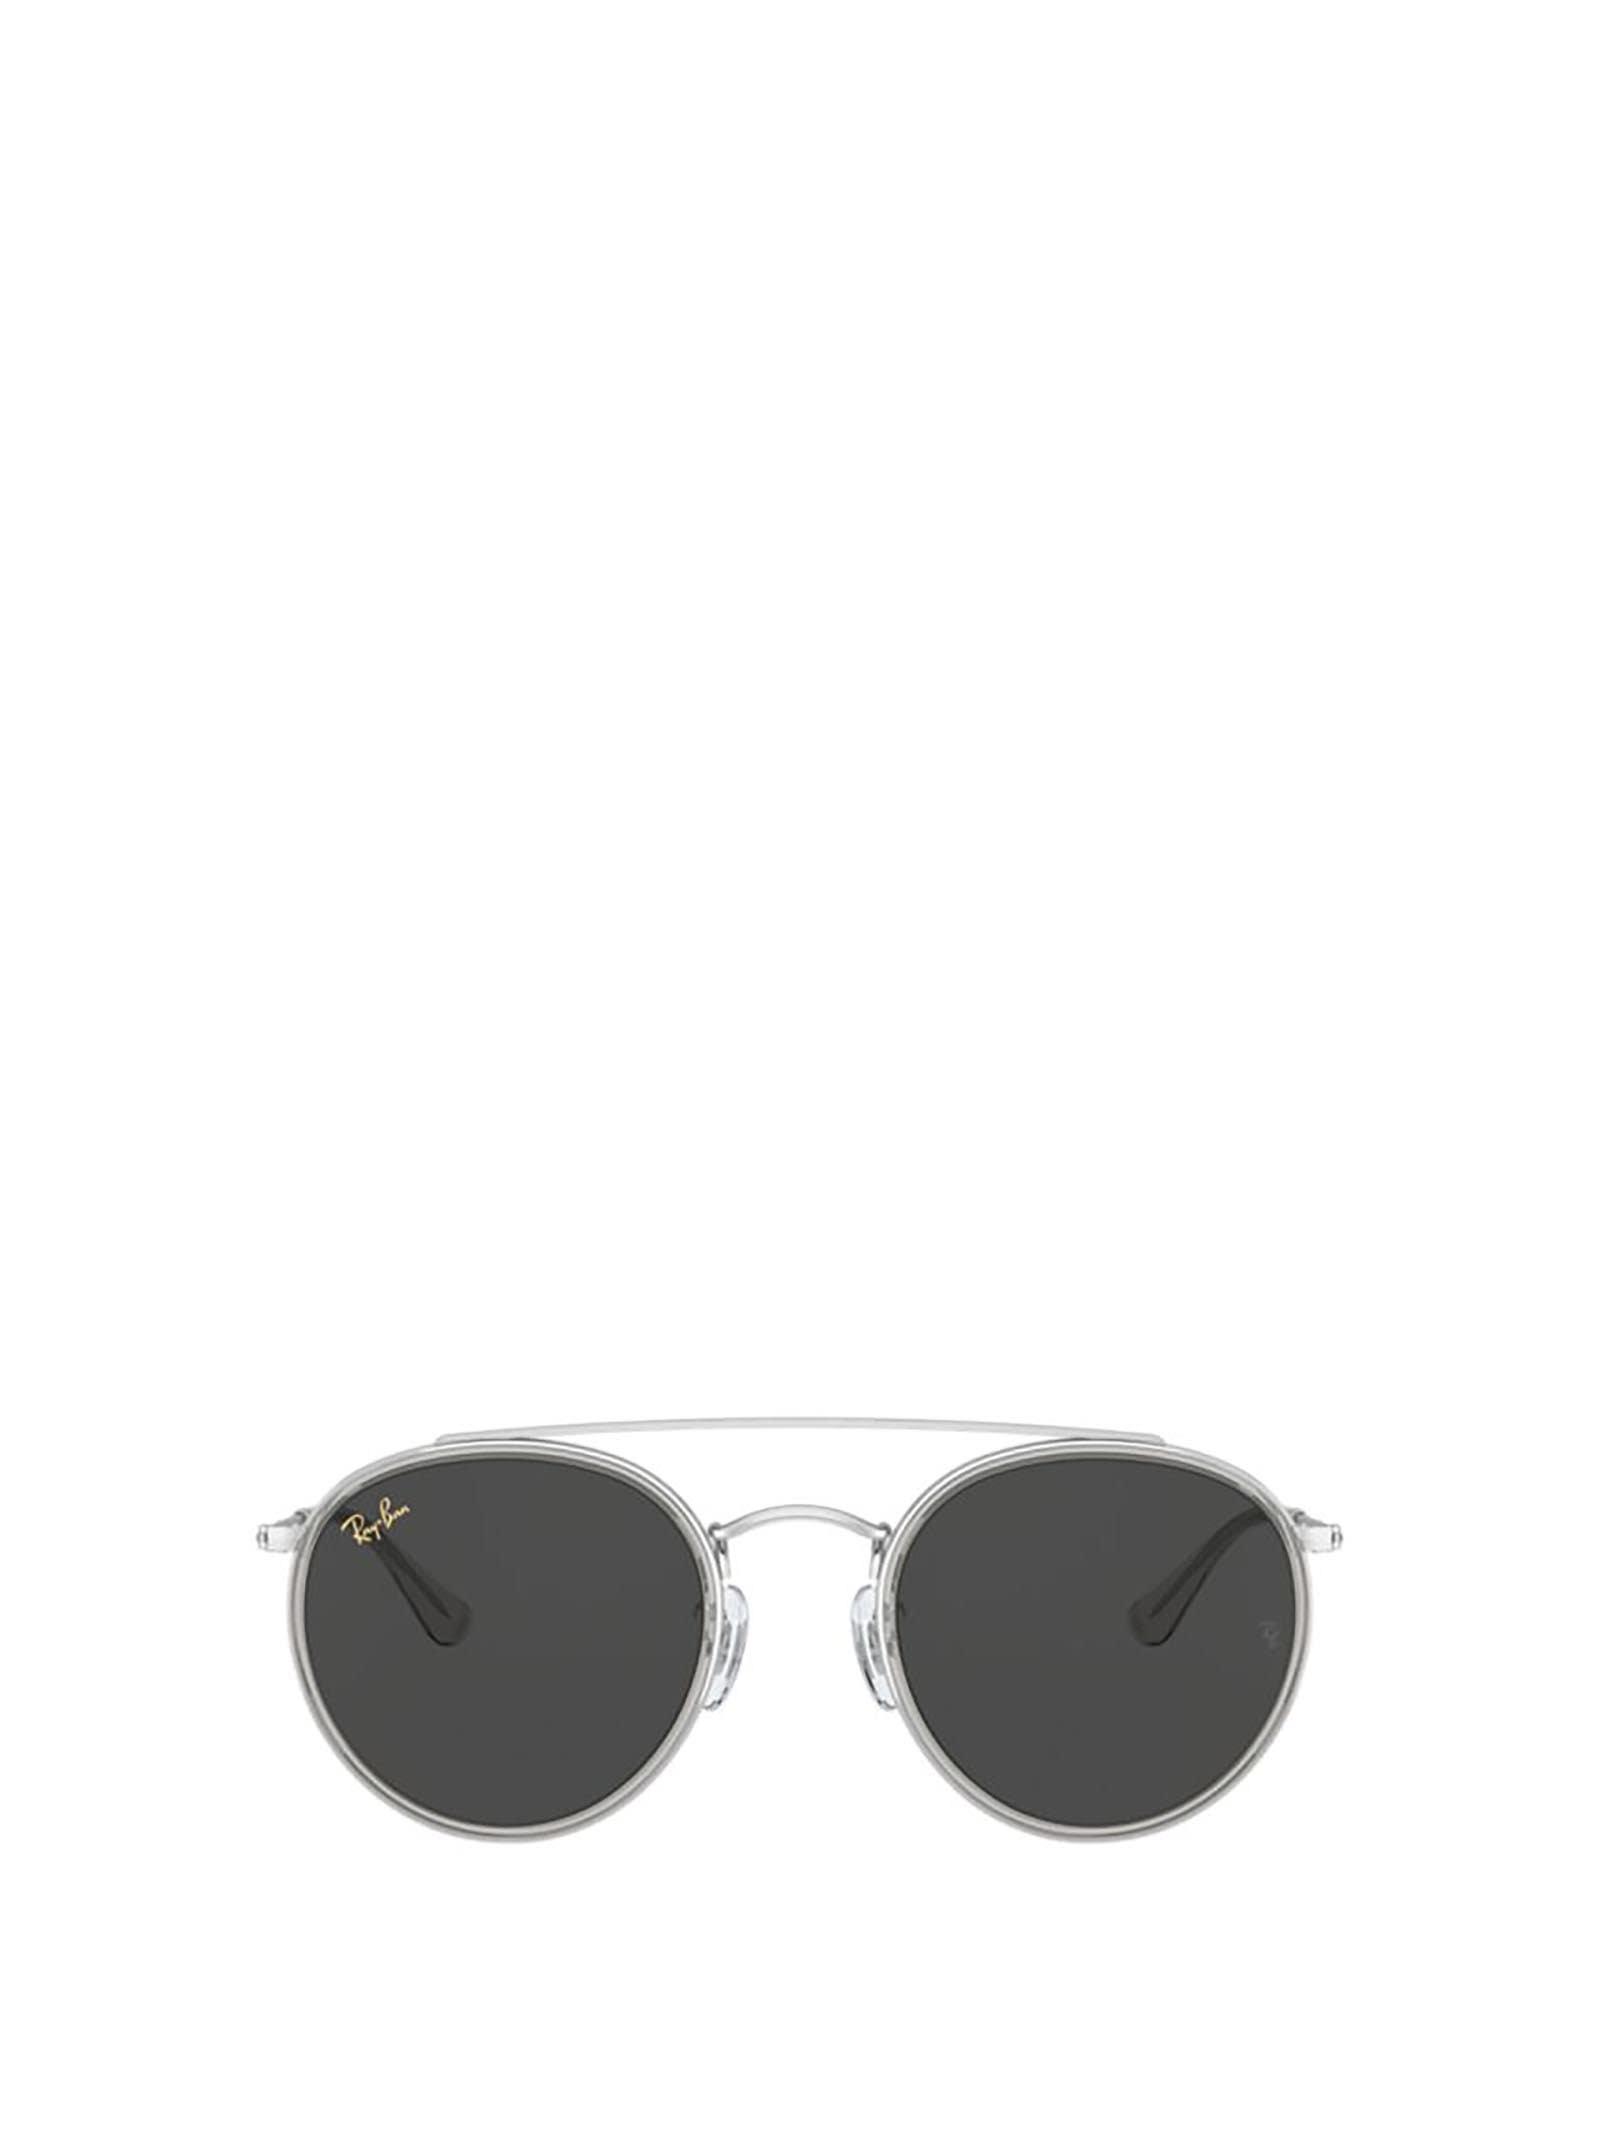 Ray-Ban Ray-ban Rb3647n Silver Sunglasses